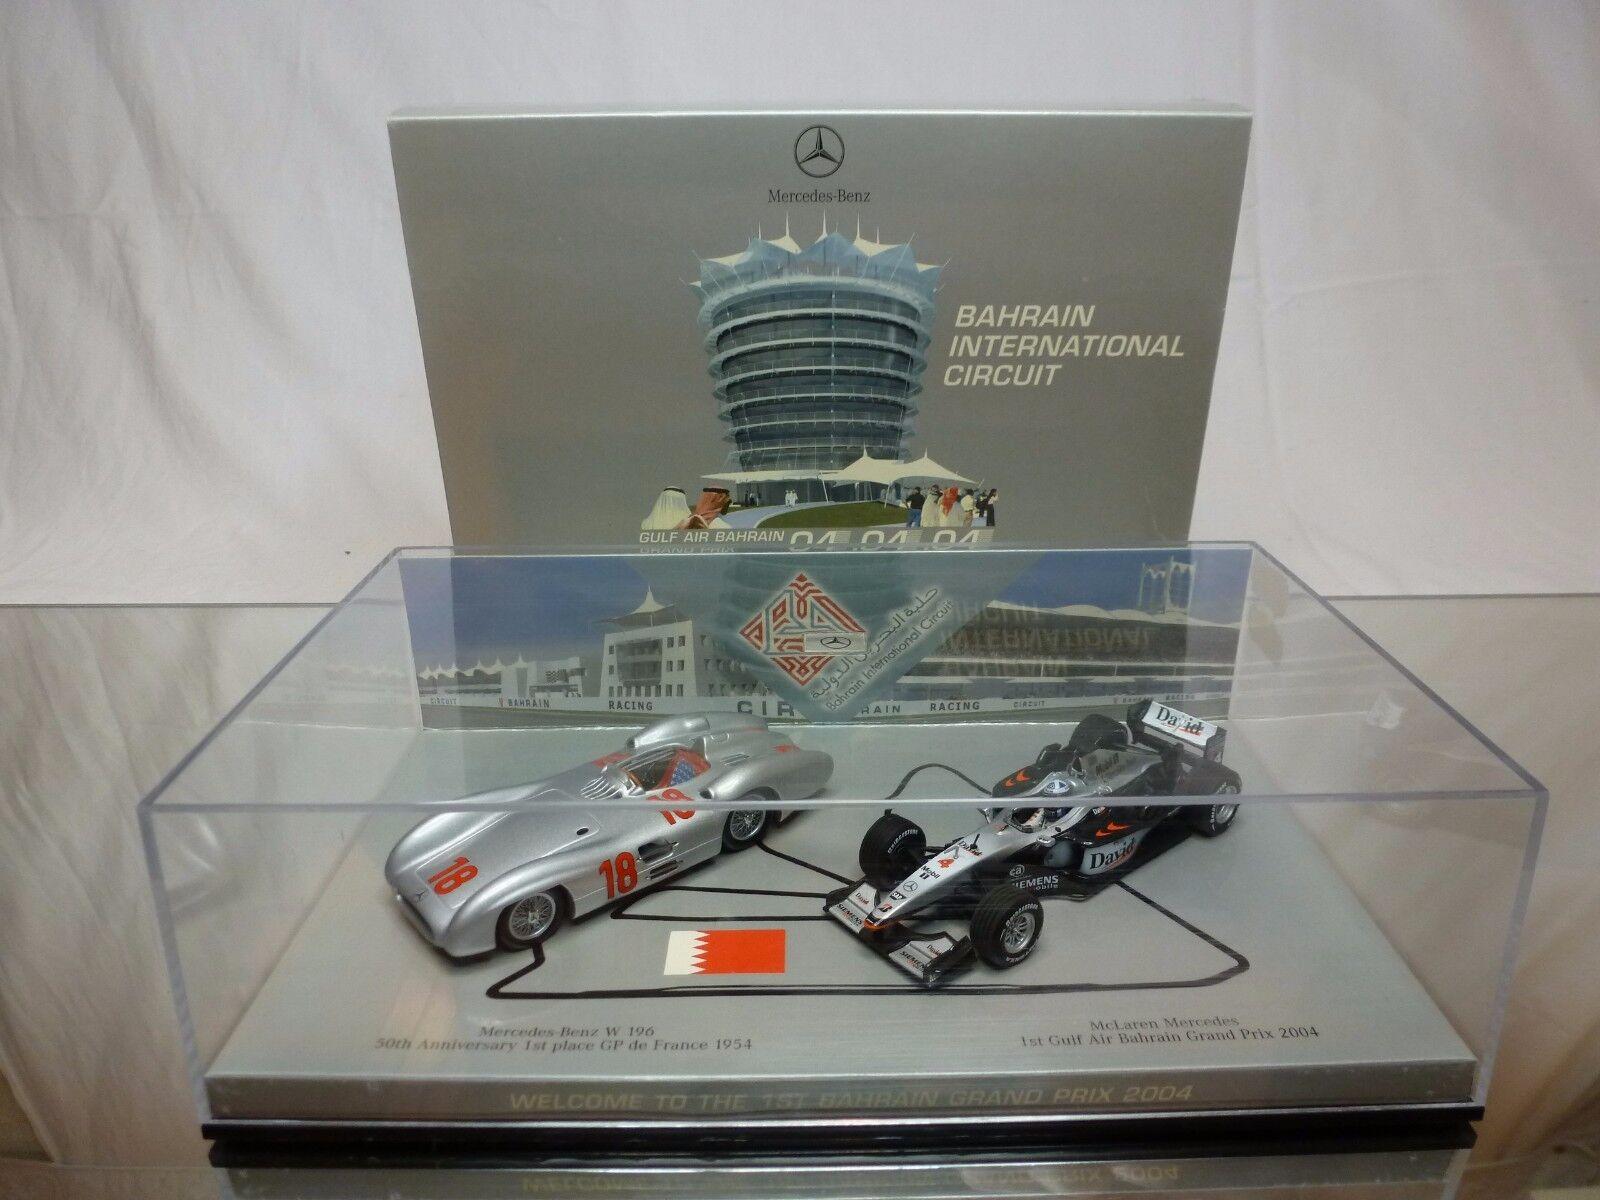 MINICHAMPS - MERCEDES BENZ W 196 + McLAREN F1 2004 1st BAHRAIN 04.04.04 - RARE